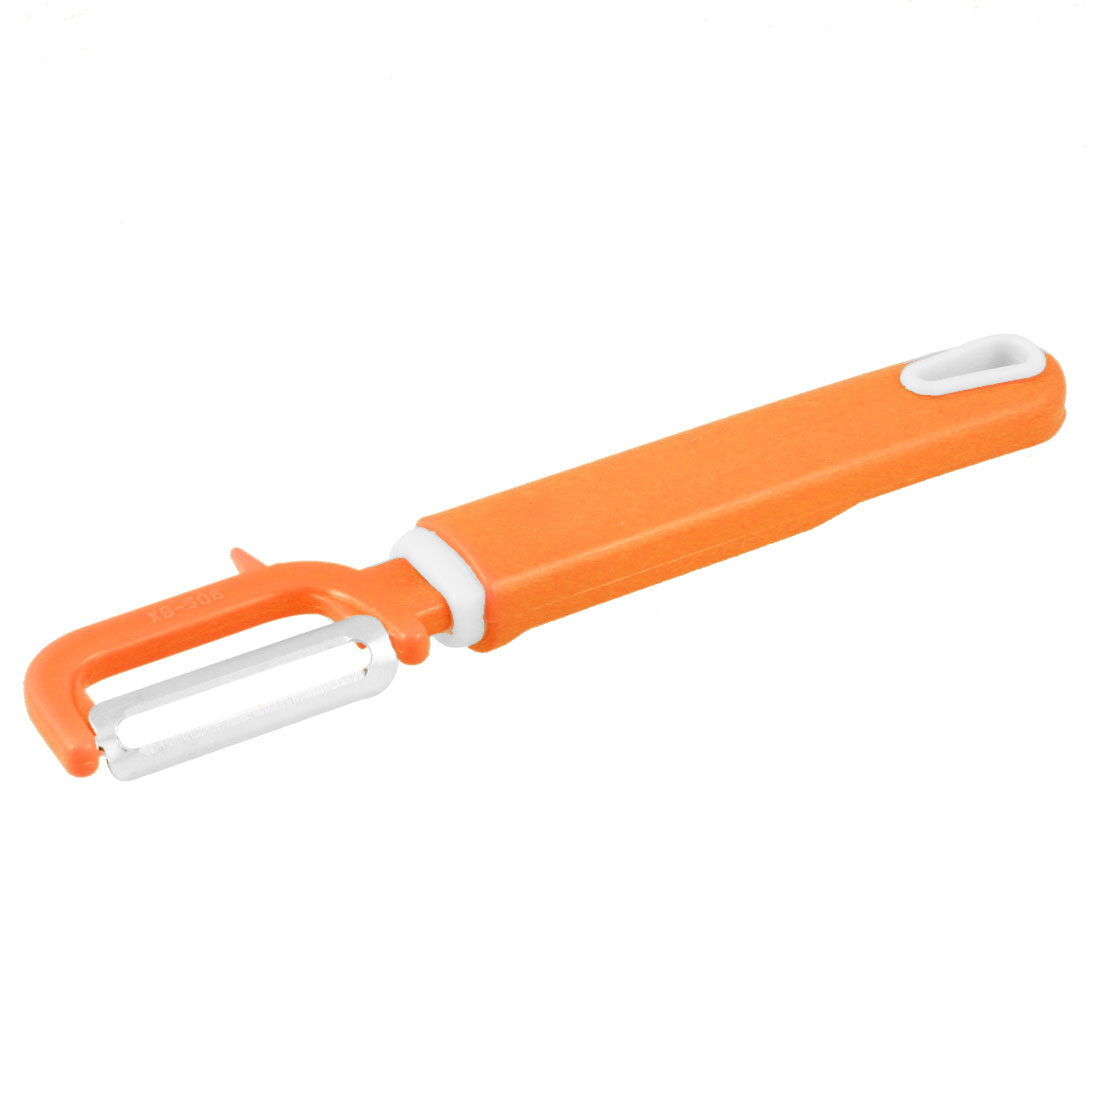 Home Stainless Steel Cutter Orange White Plastic Handle Fruit Peeler